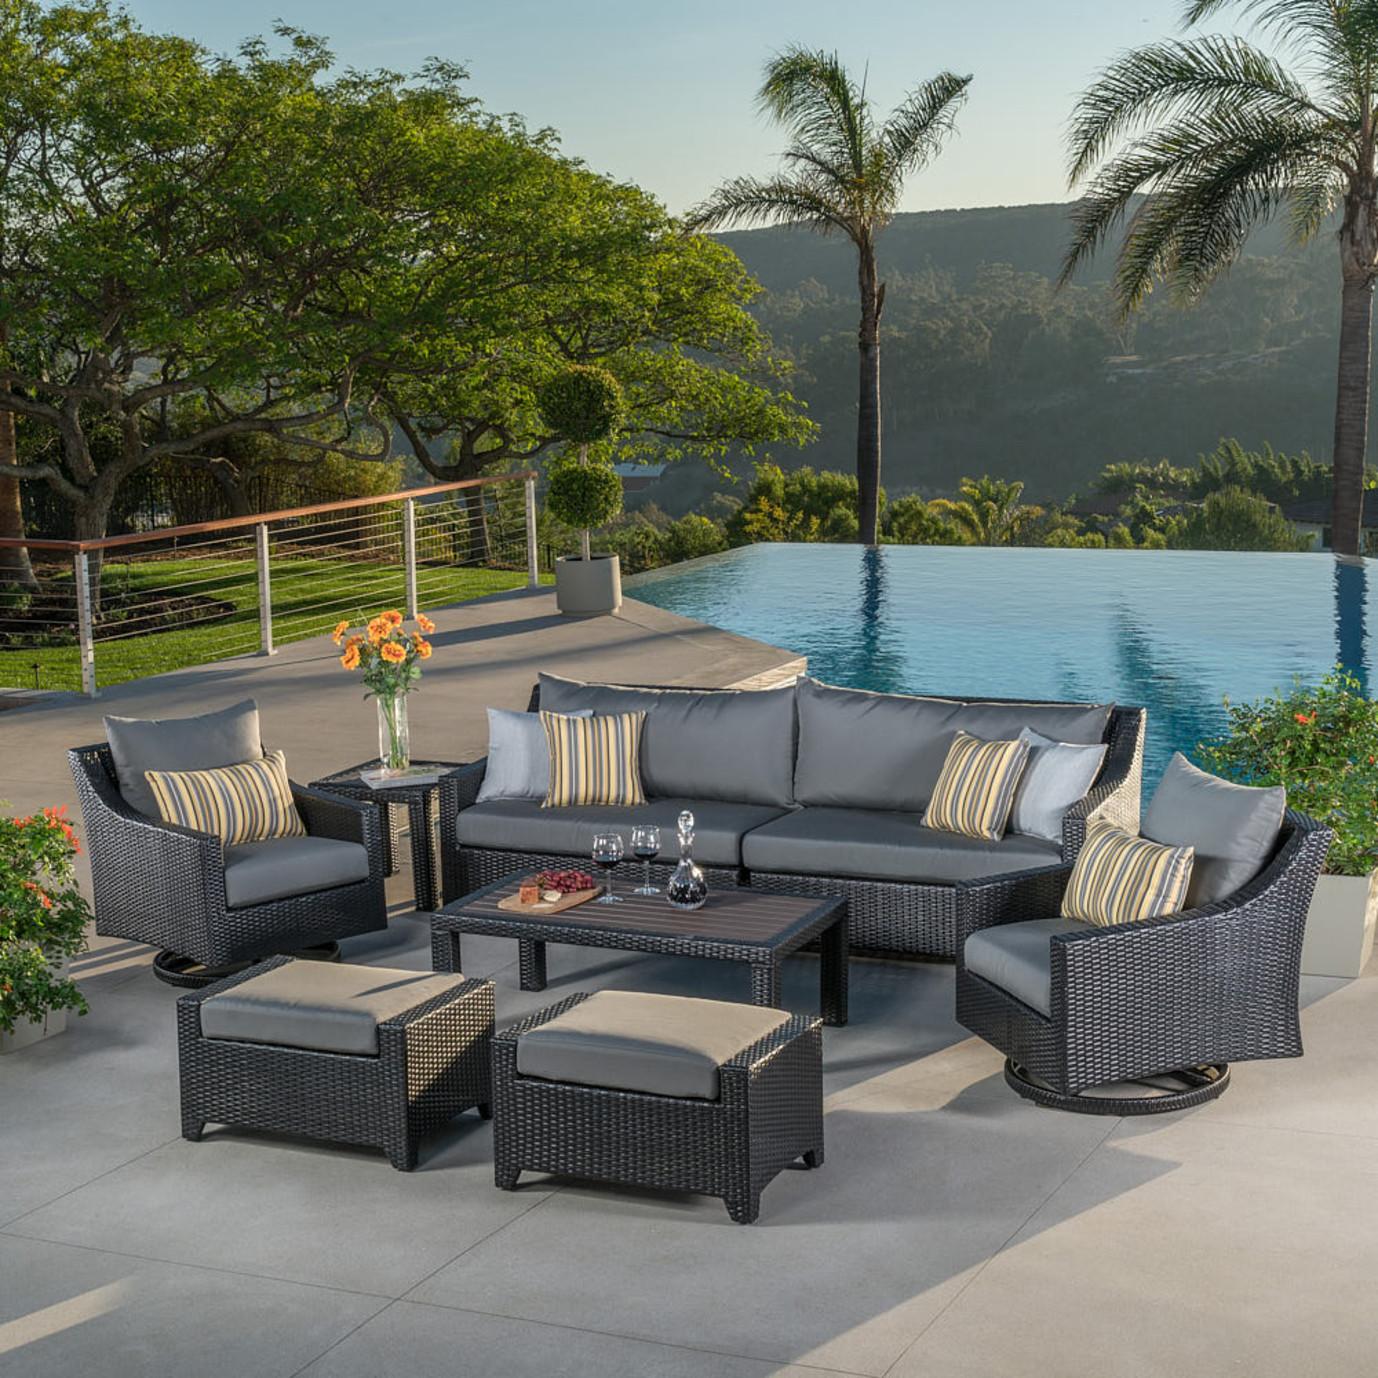 Deco™ 8 Piece Sofa & Club Chair Furniture Cover Set